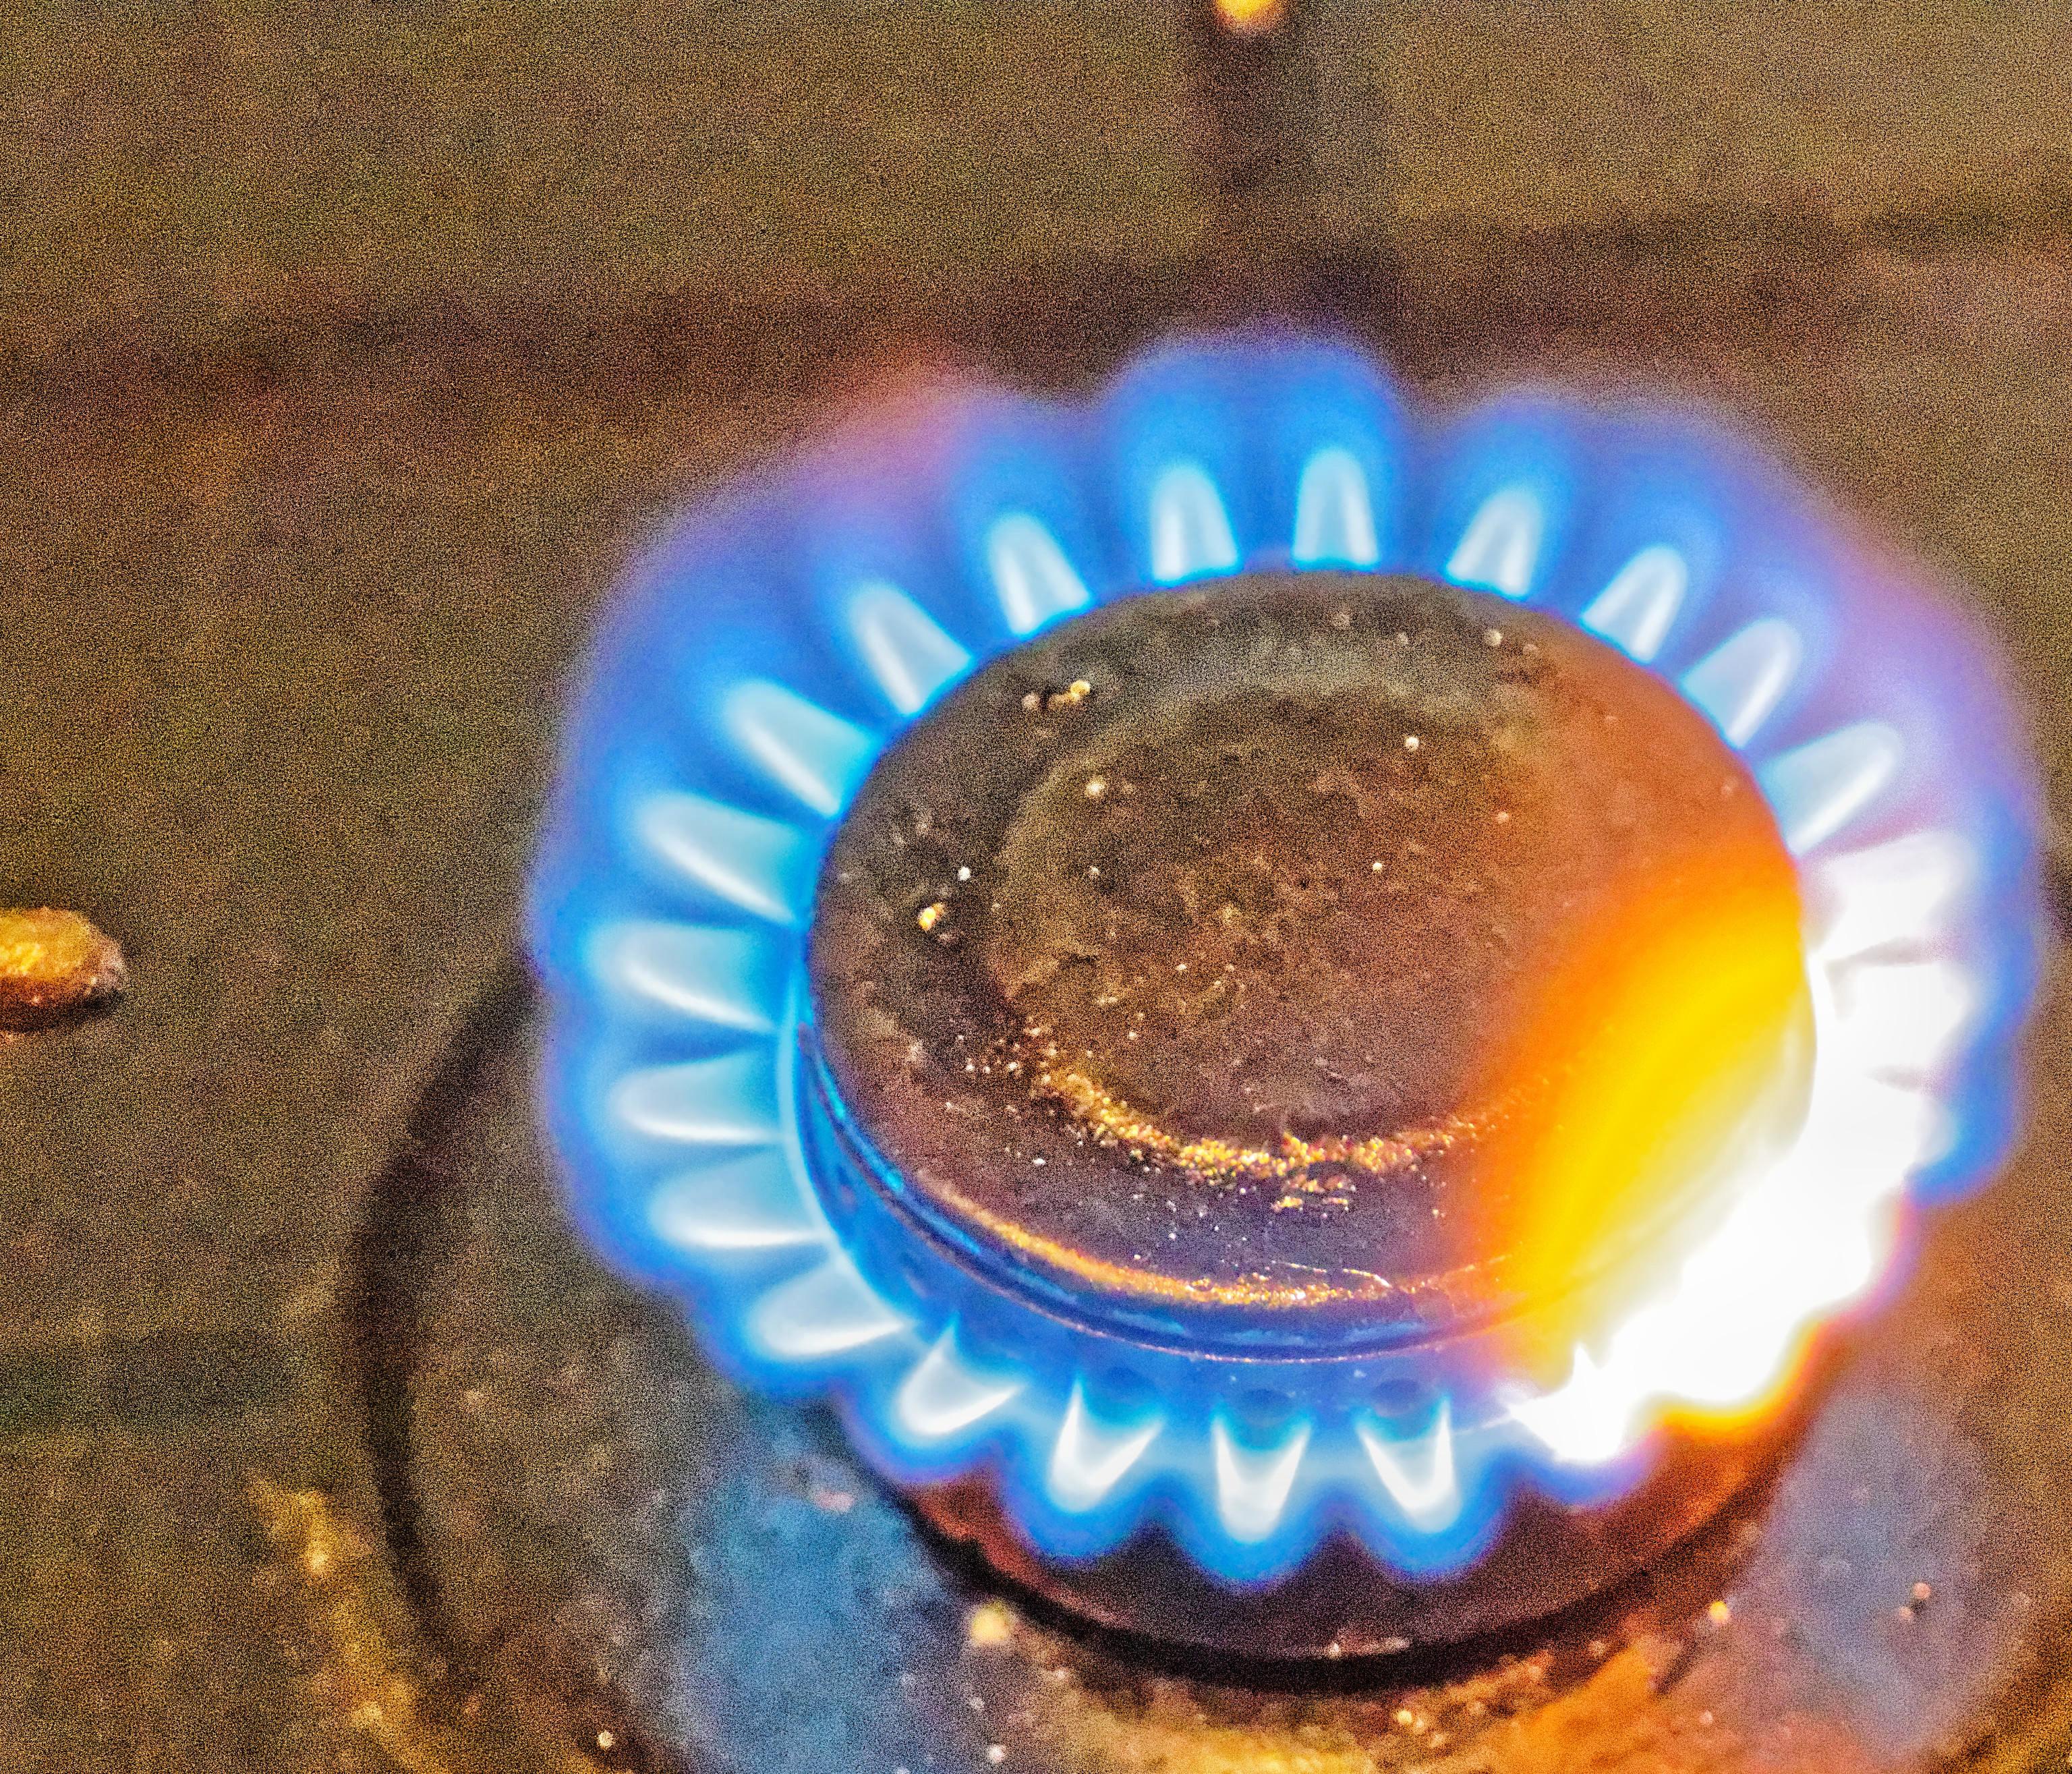 Gas-flame-4.jpeg